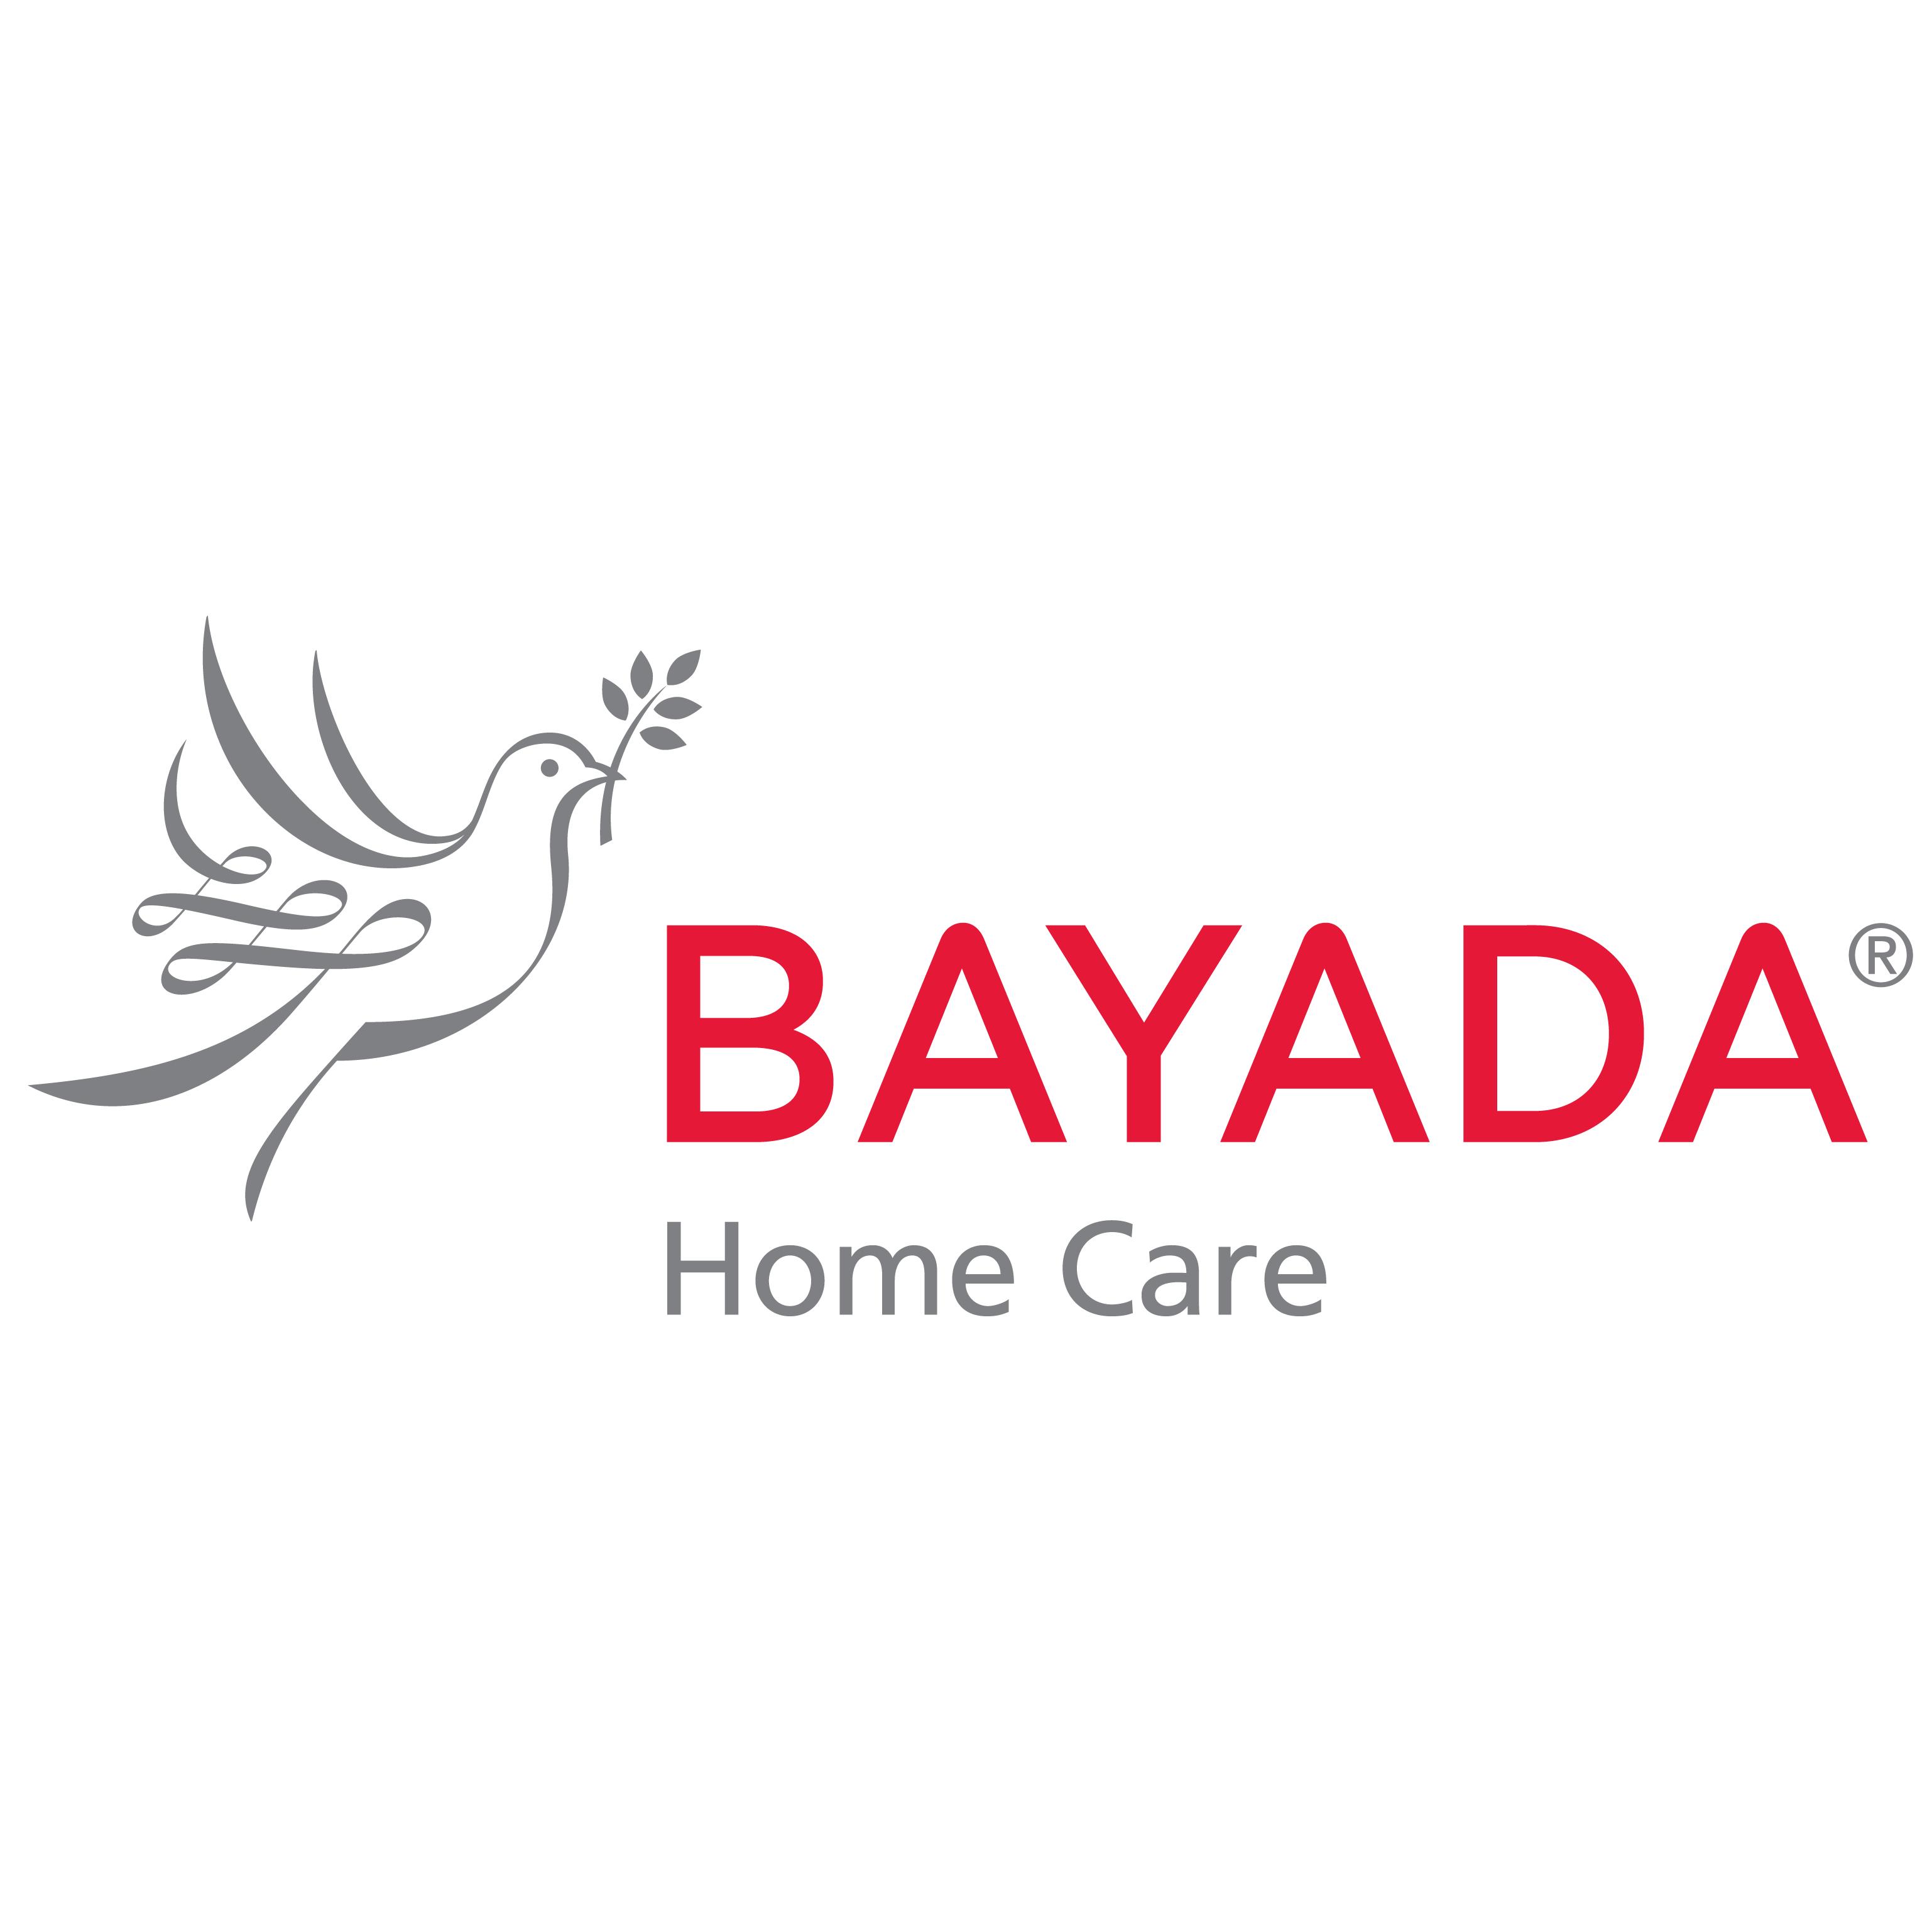 BAYADA Maui Home Care - Wailuku, HI 96793 - (808)244-4700 | ShowMeLocal.com